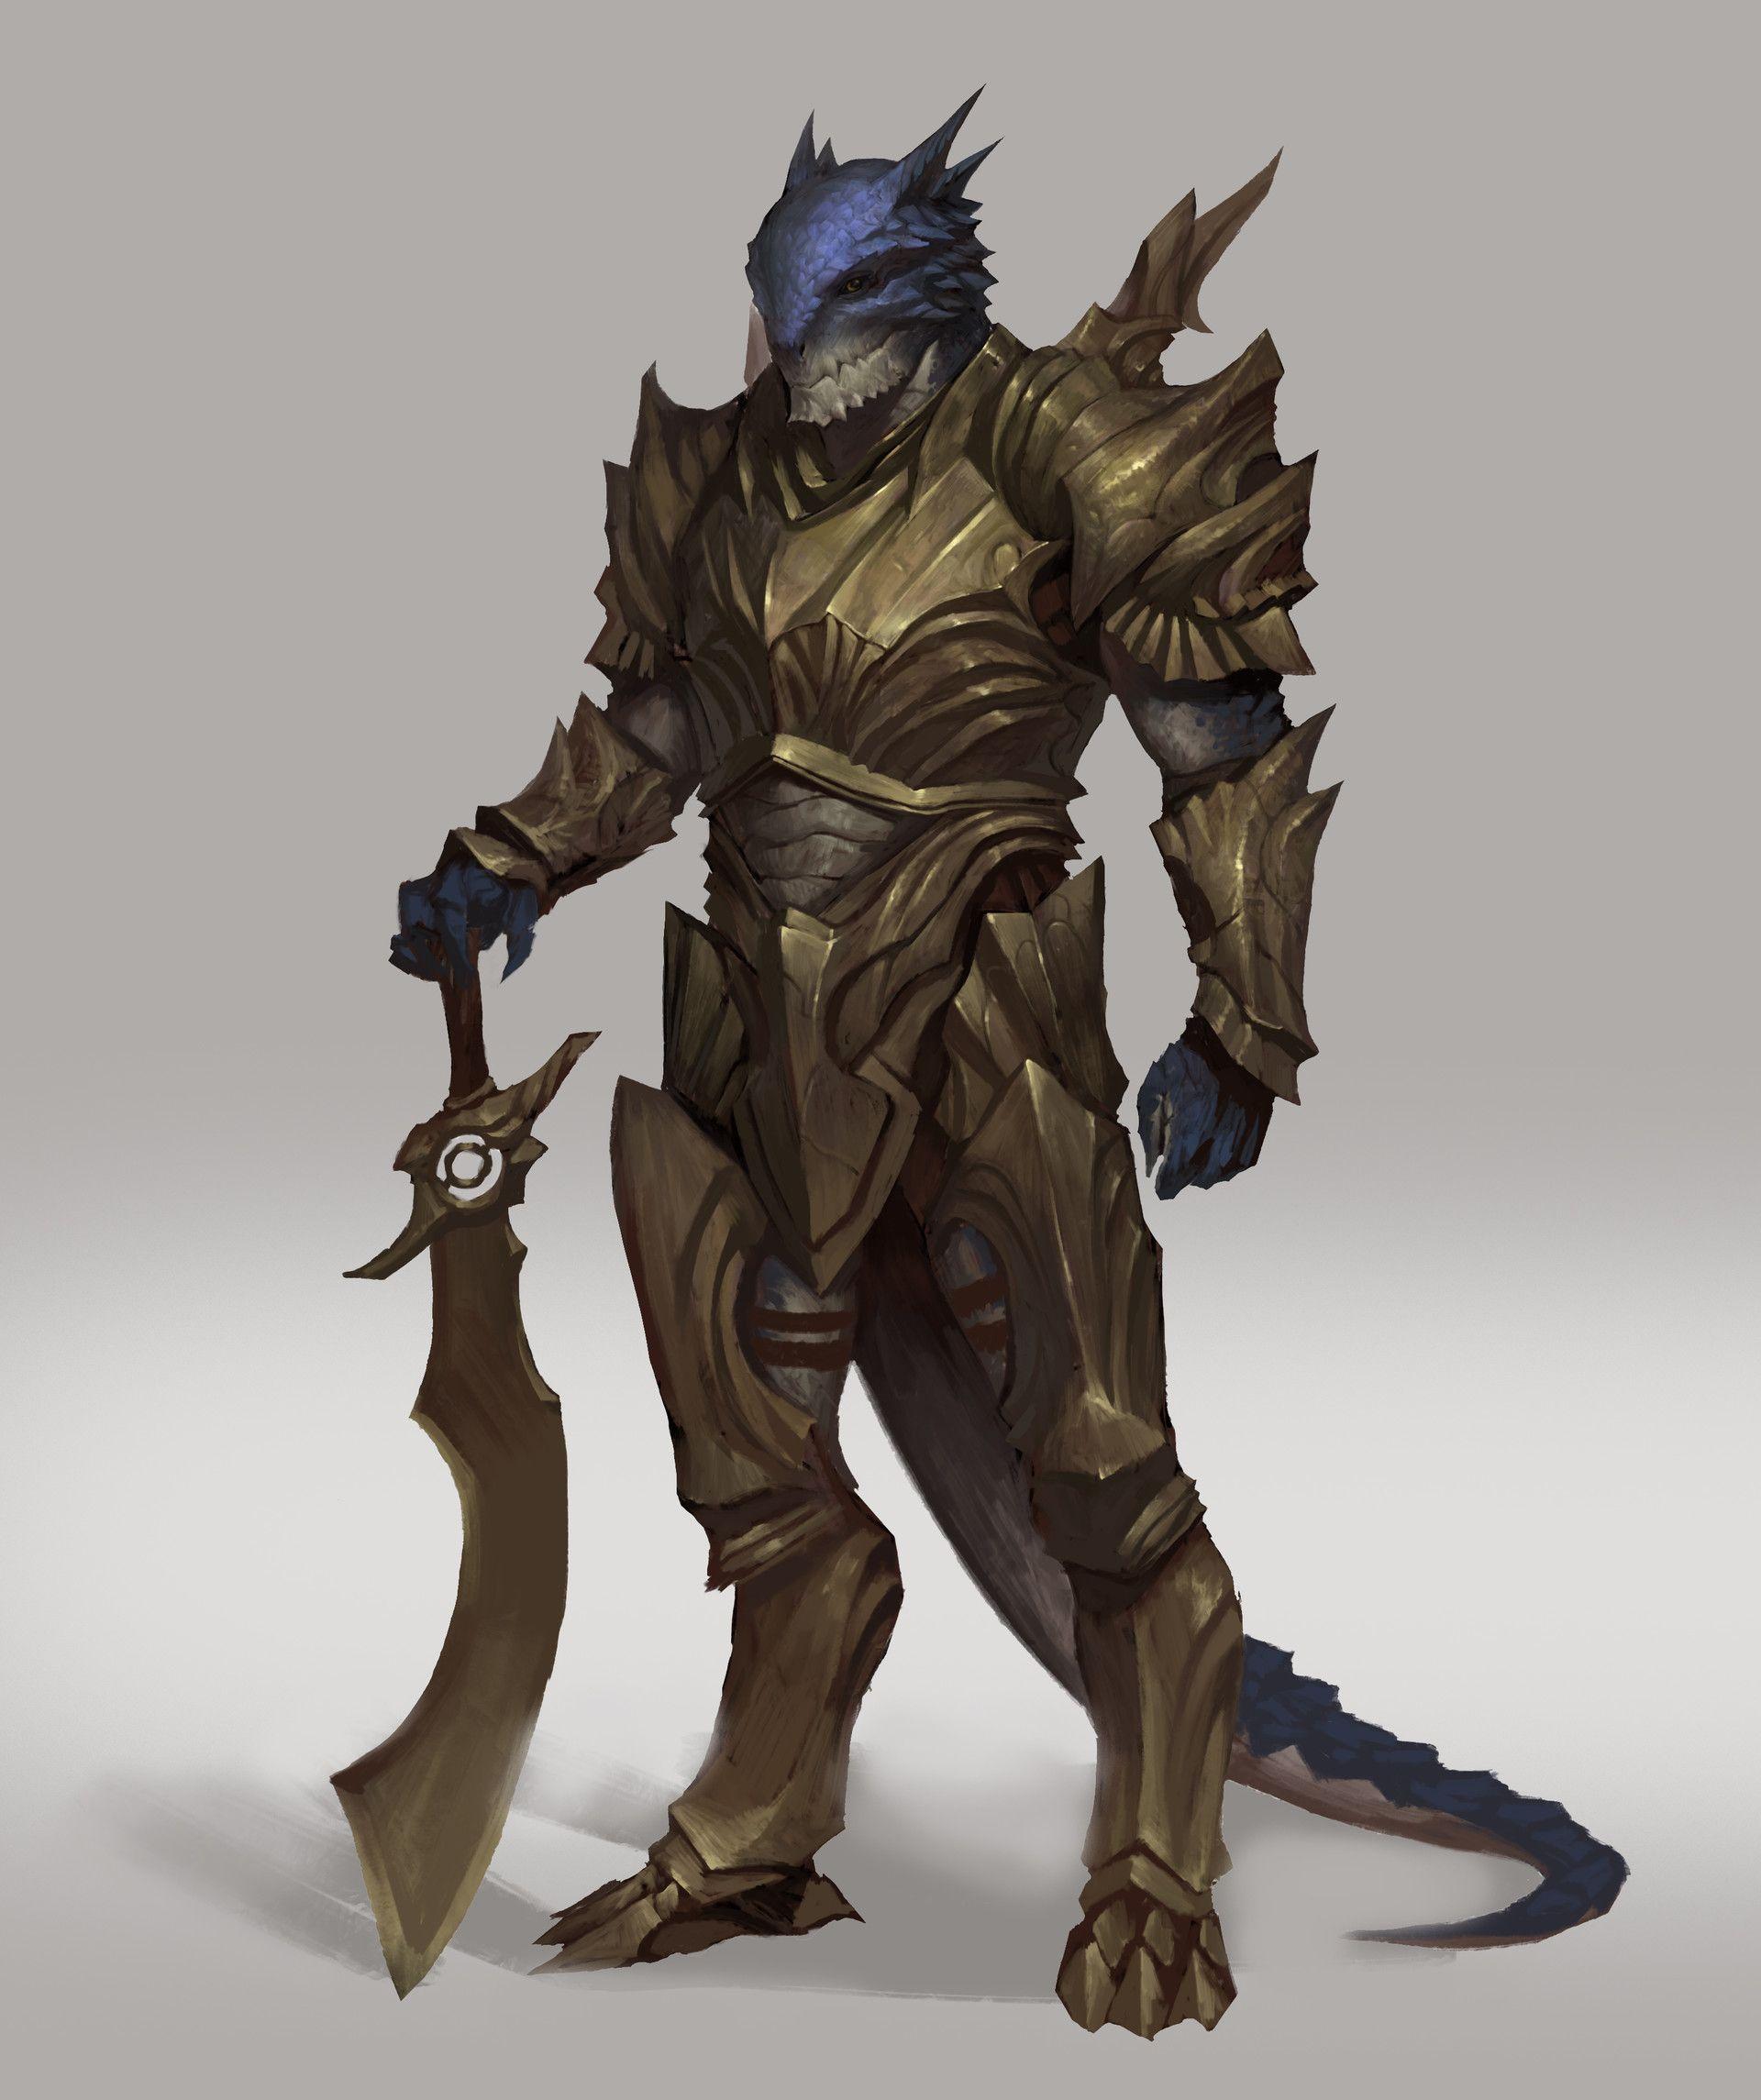 ArtStation - Argonian warrior haha, Jiamin Lin